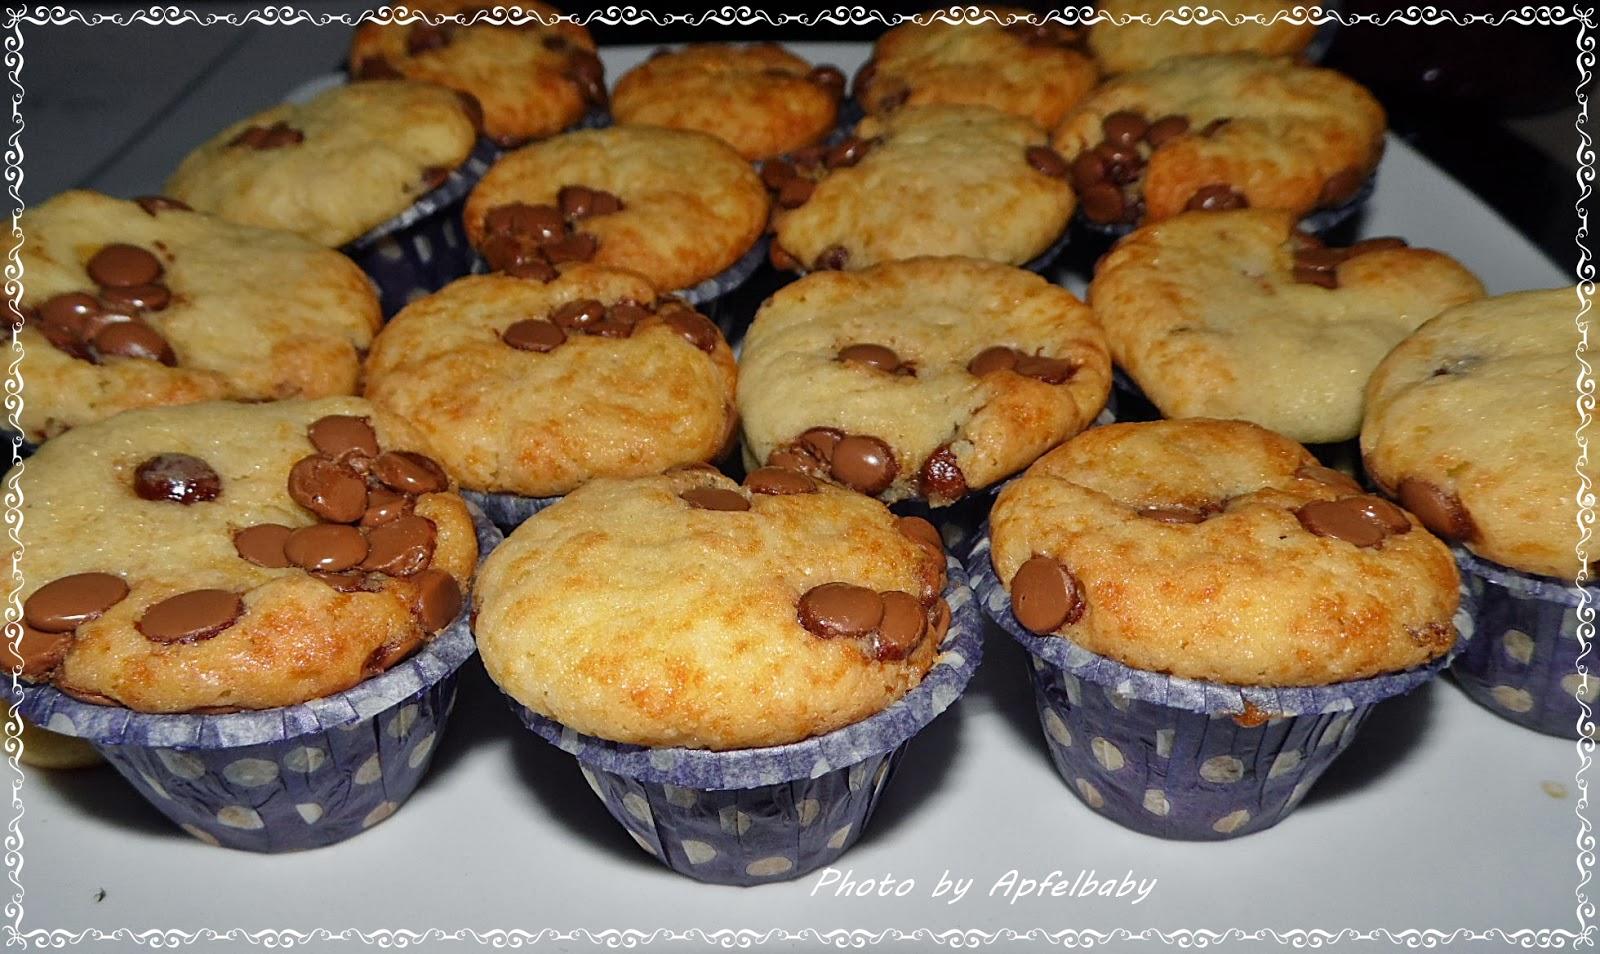 familie apfelbaby produkttest milka mini muffins und haferkekse. Black Bedroom Furniture Sets. Home Design Ideas